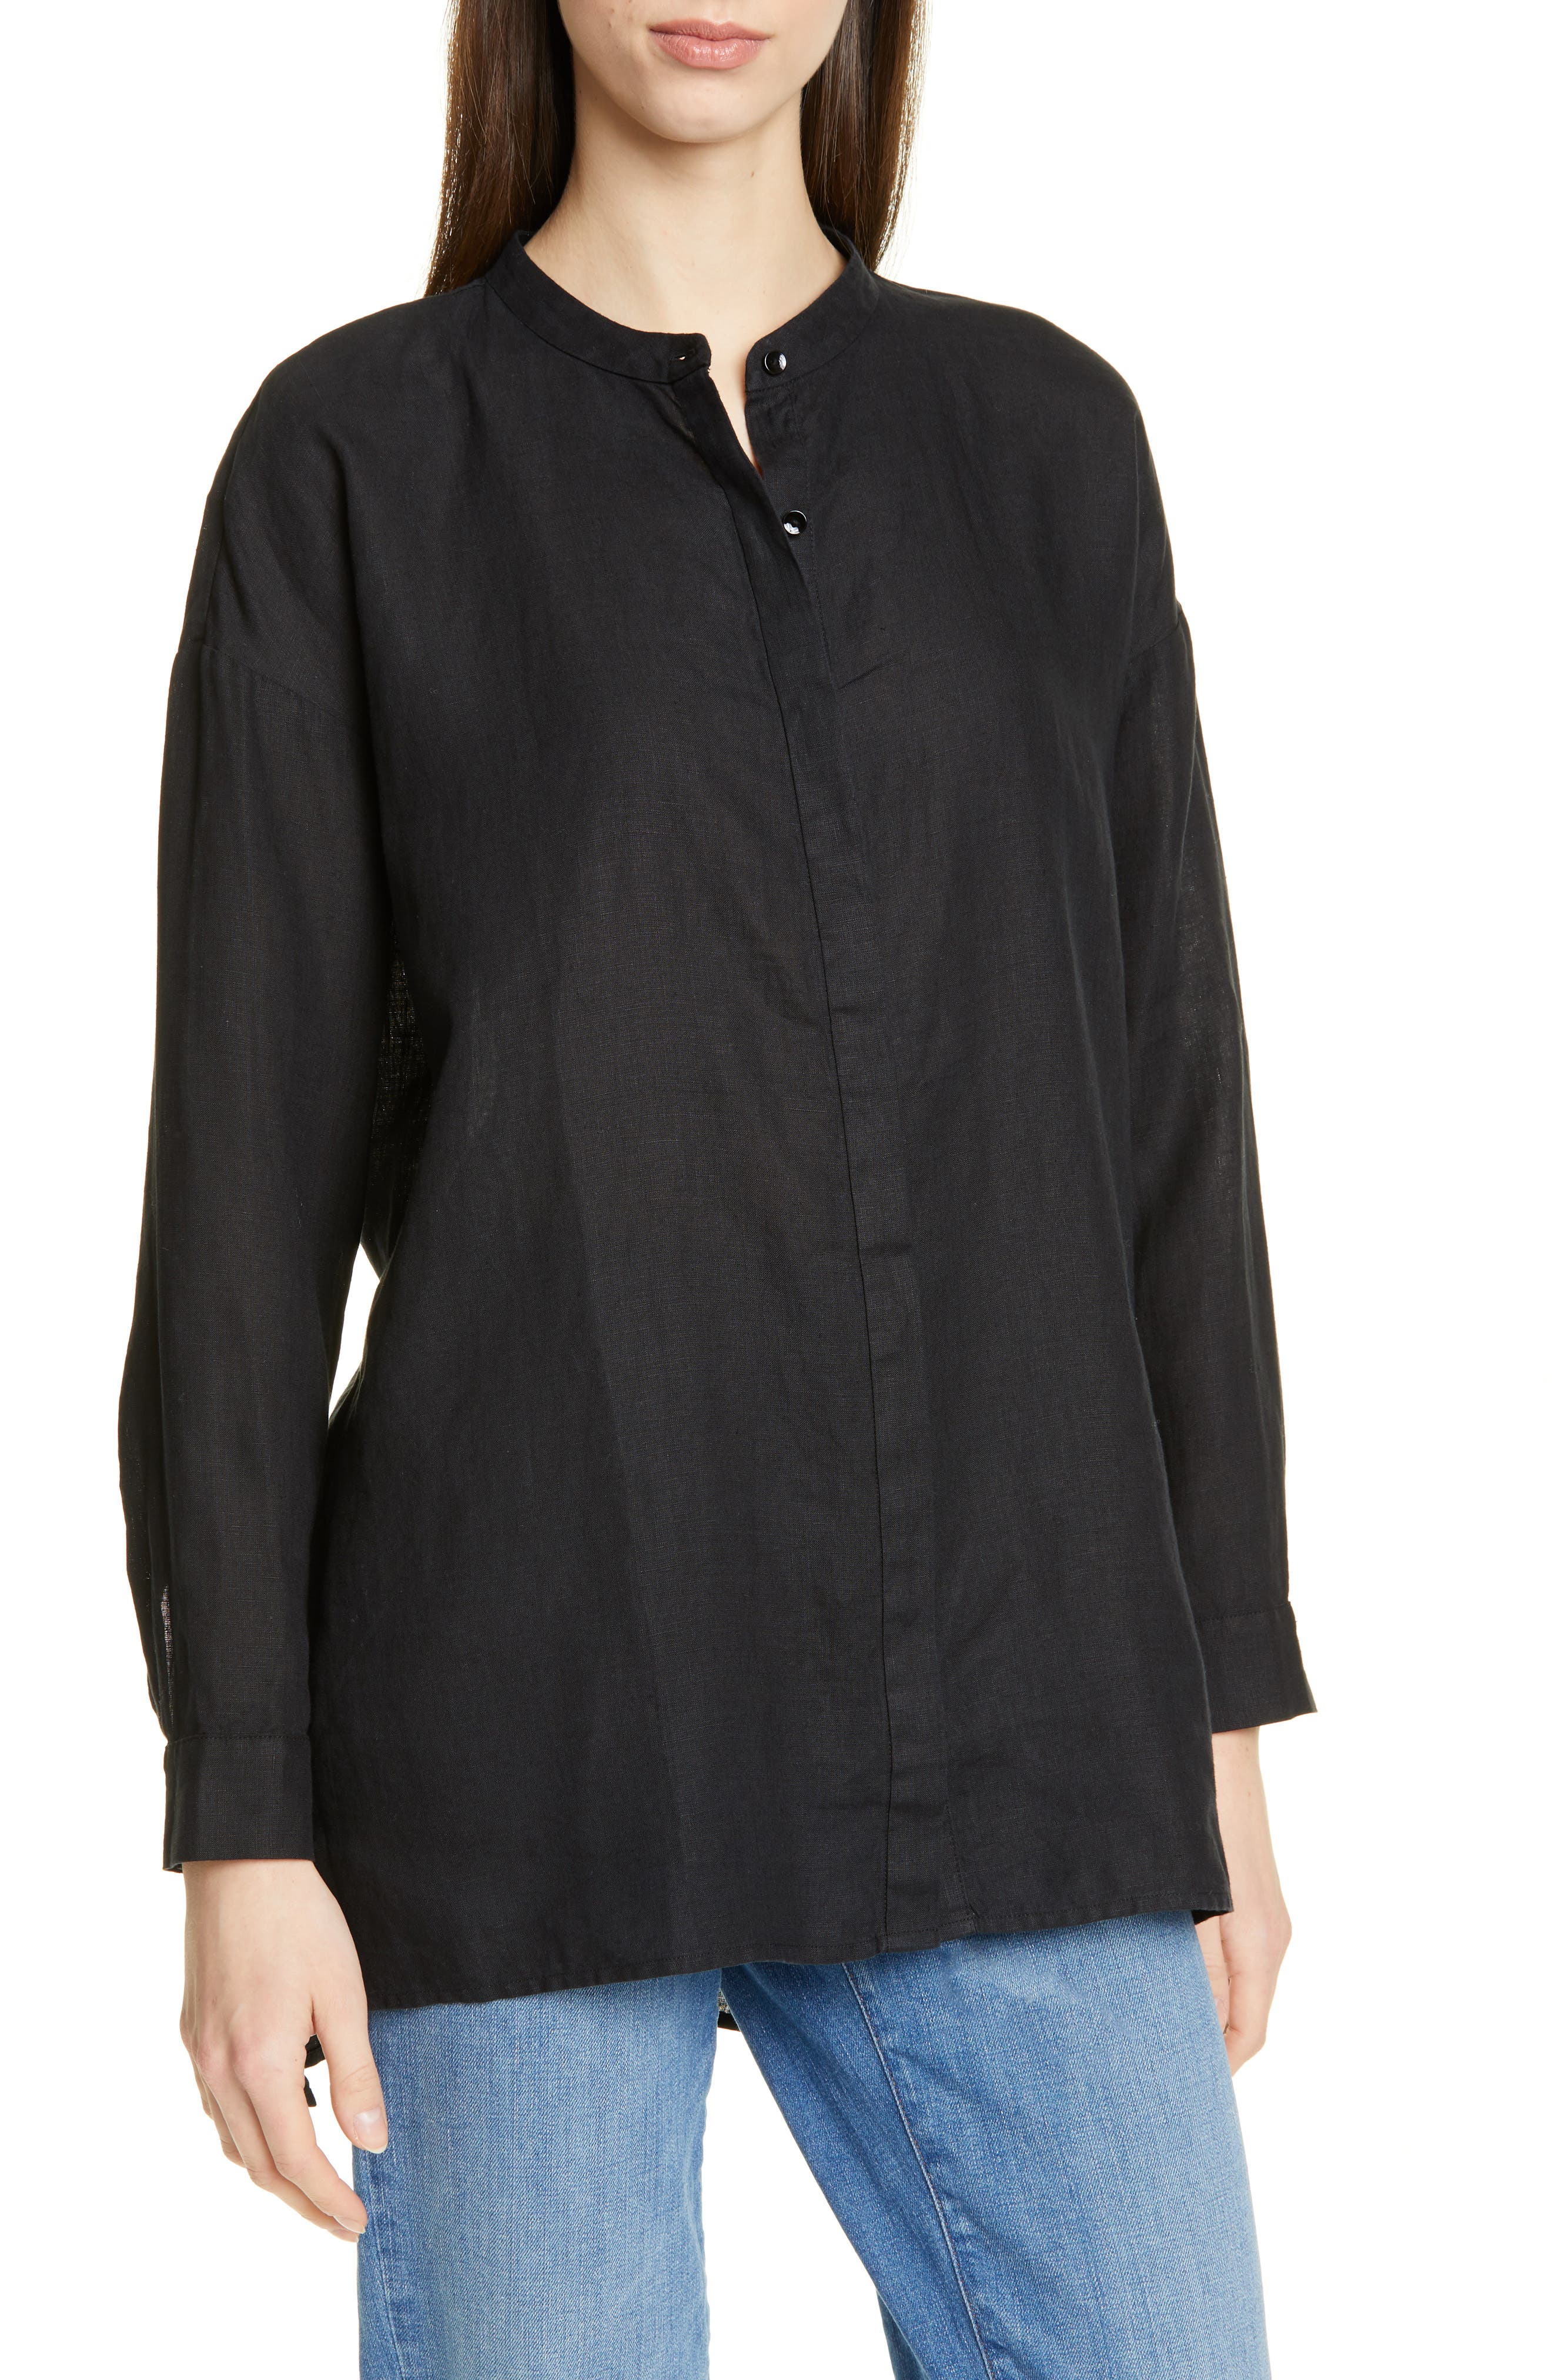 Image of Eileen Fisher Organic Linen Tunic Shirt